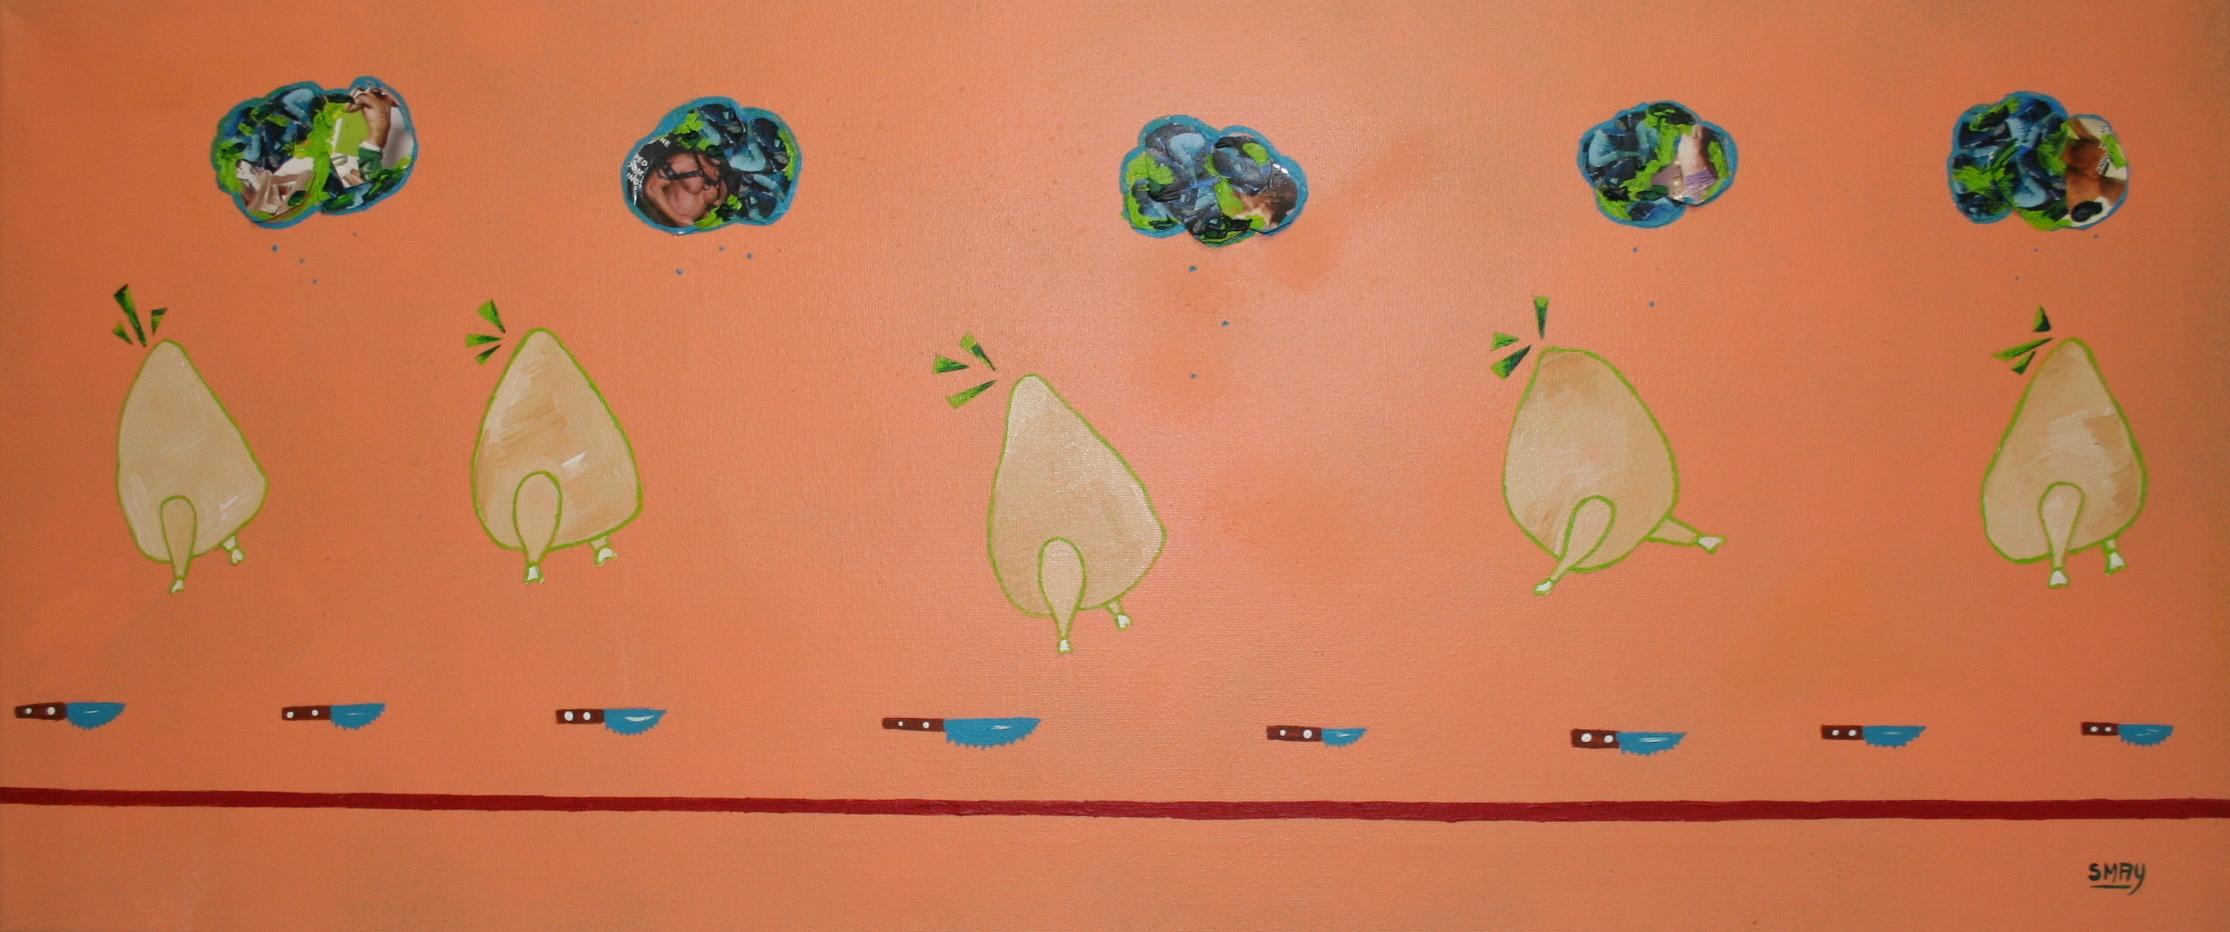 Chicken run  2012 Mixed media on canvas 70 x 30cm